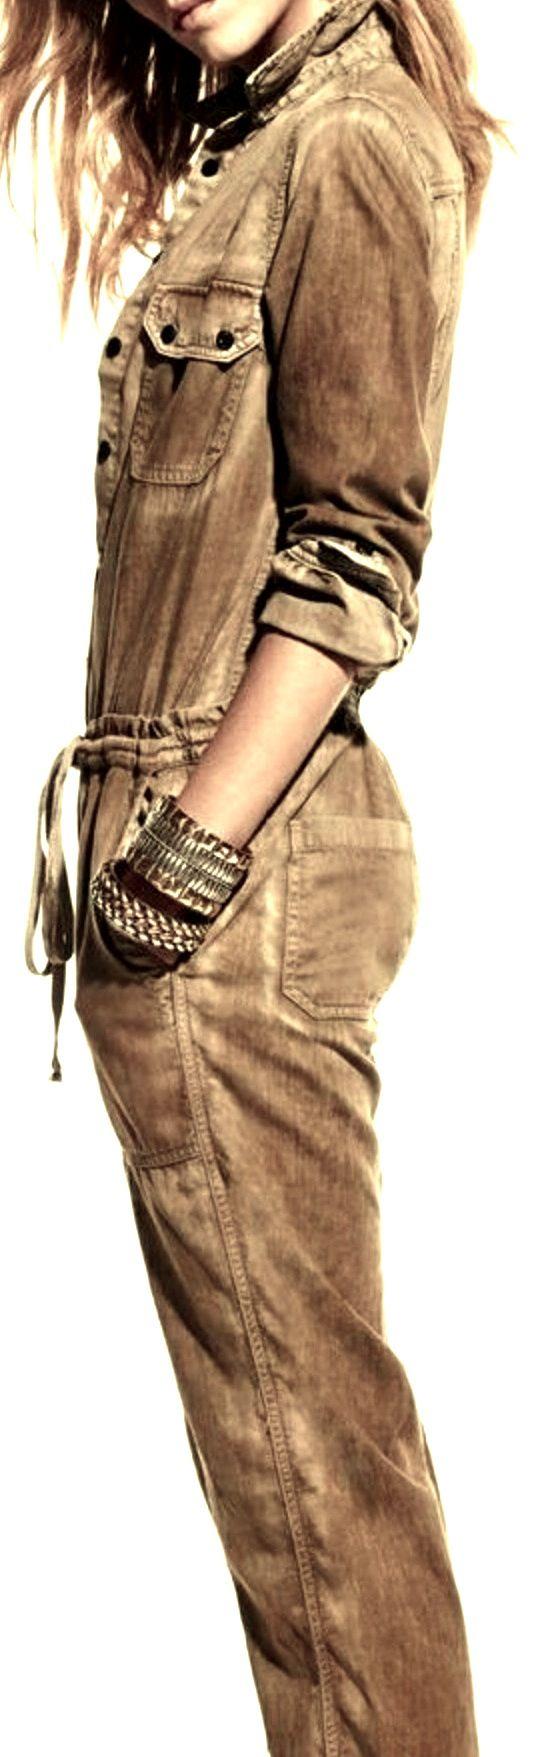 TREND SS 2015 :Into the wild #fashiondivaparisnyc #thefashiondiva www.fashiondiva-parisnyc.com